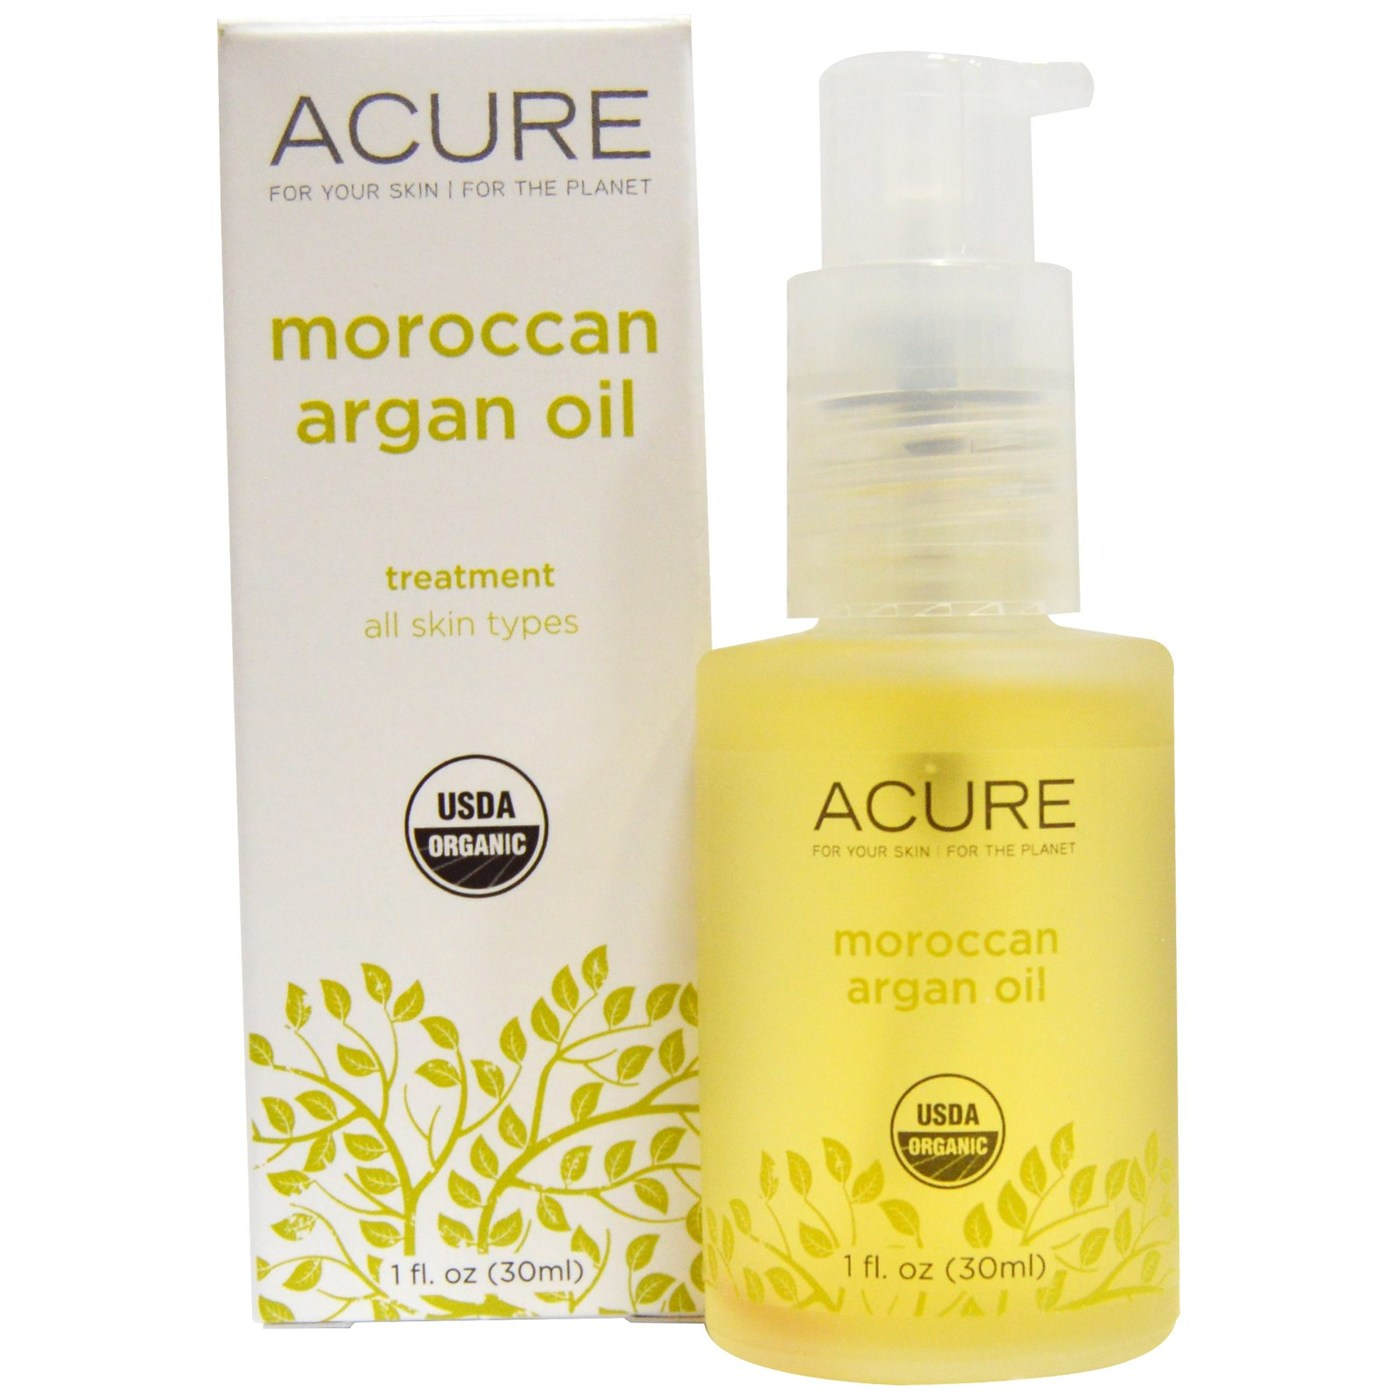 acure moroccan argan oil rose reviews